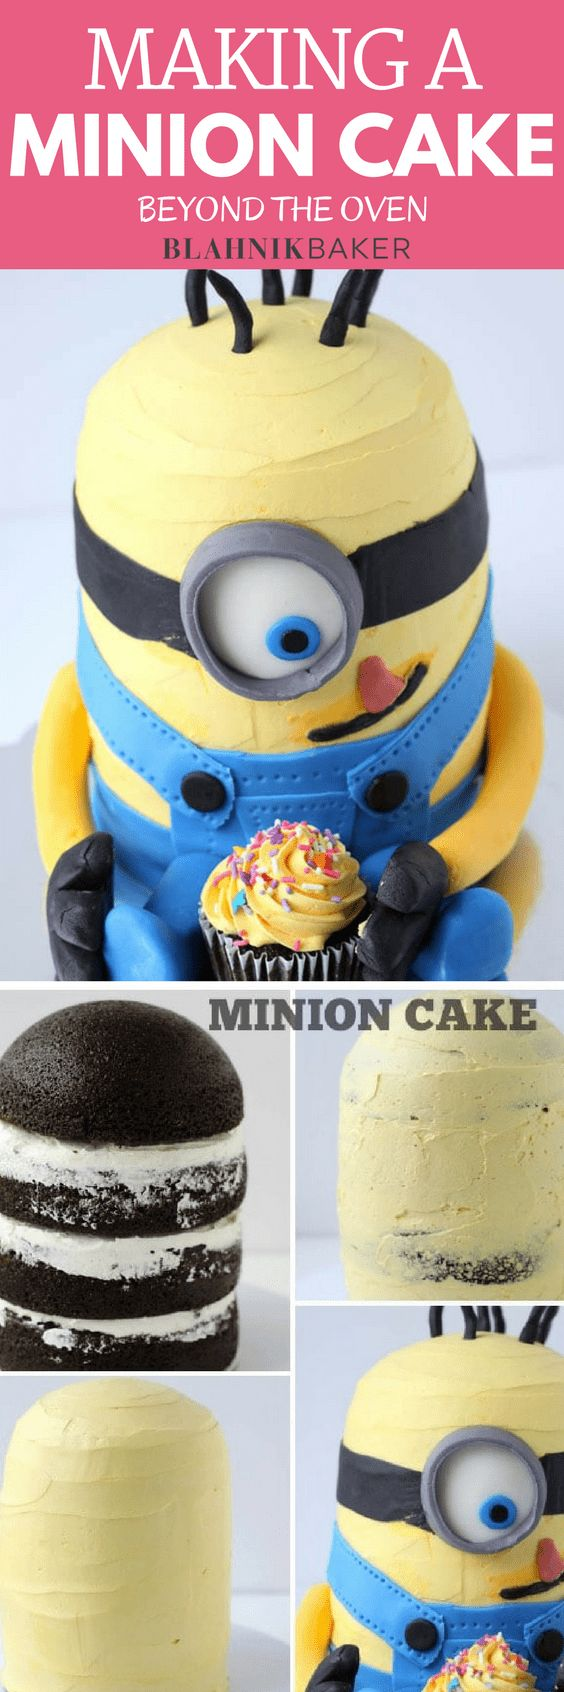 minion template for cake - best 25 fondant minions ideas on pinterest minion cake